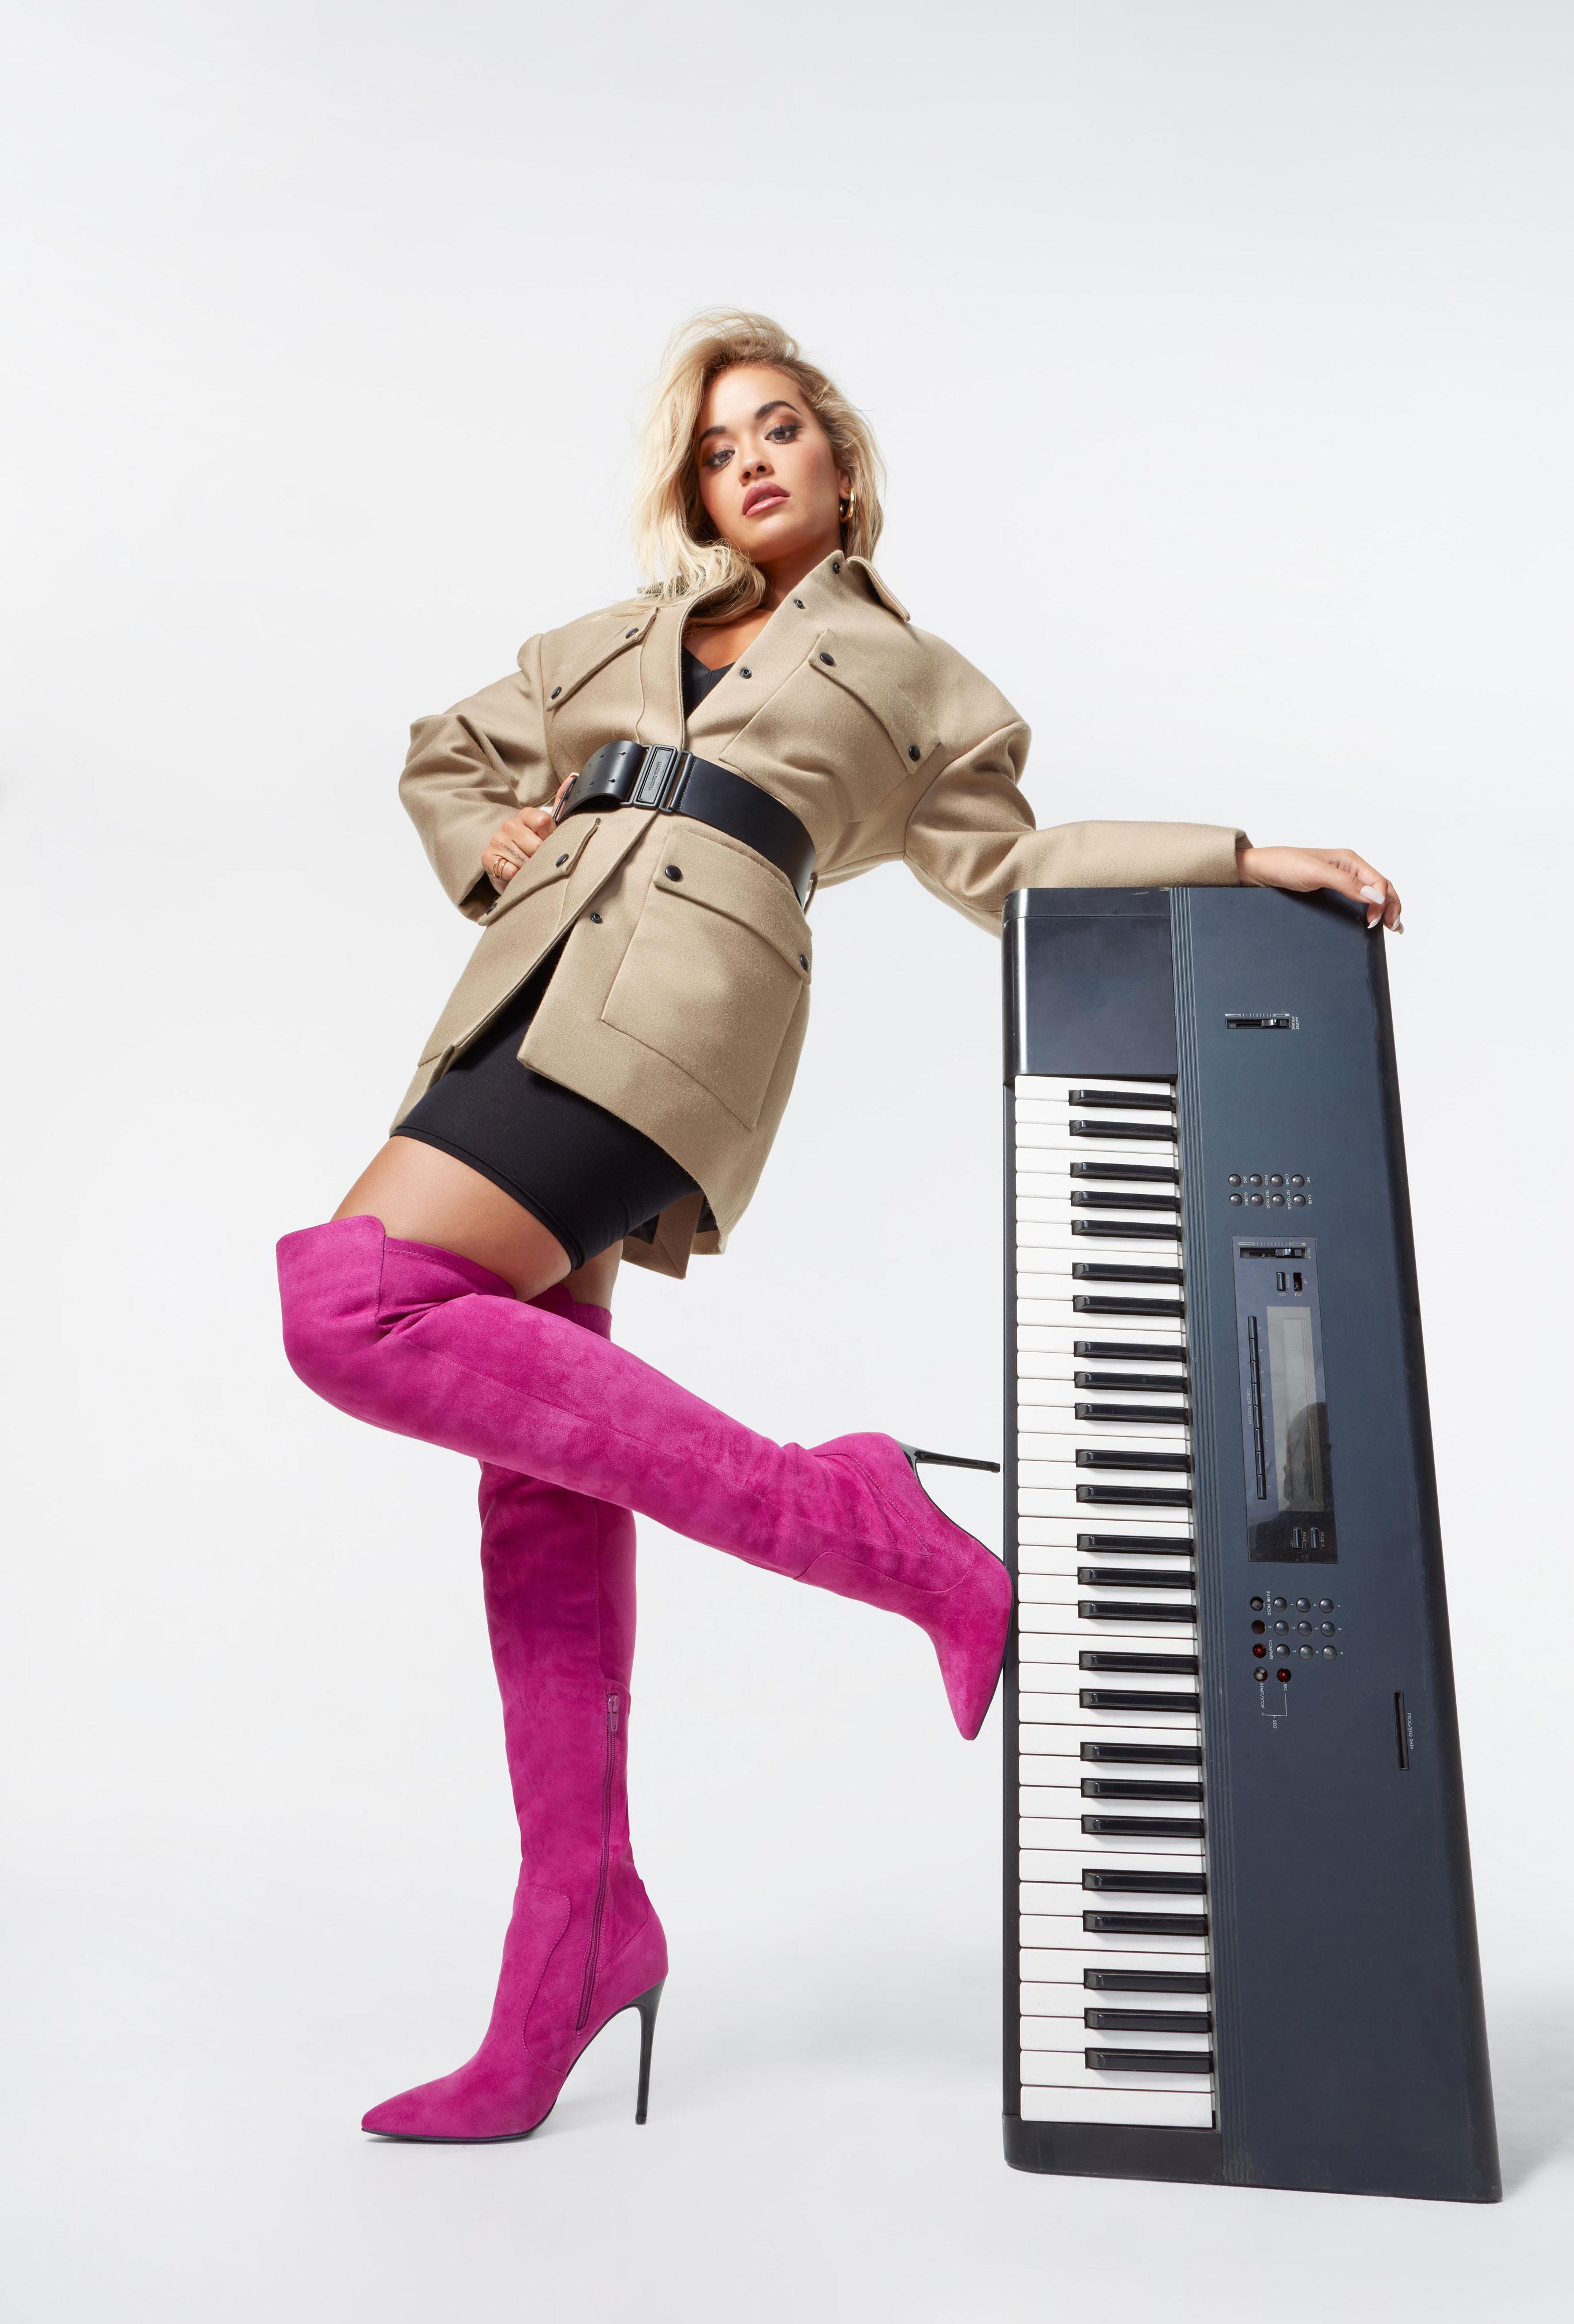 Рита Ора в обуви модного бренда ShoeDazzle, сезон 2020 / фото 26